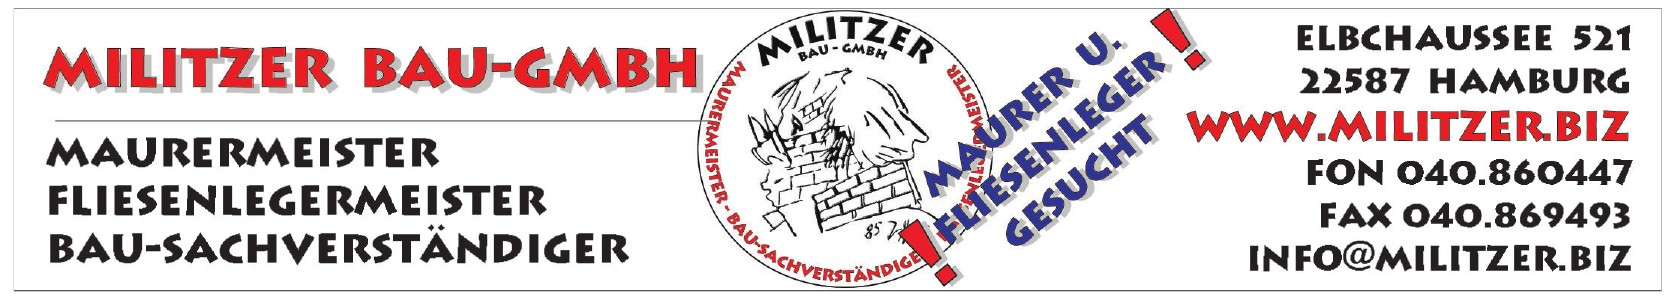 Militzer Bau GmbH